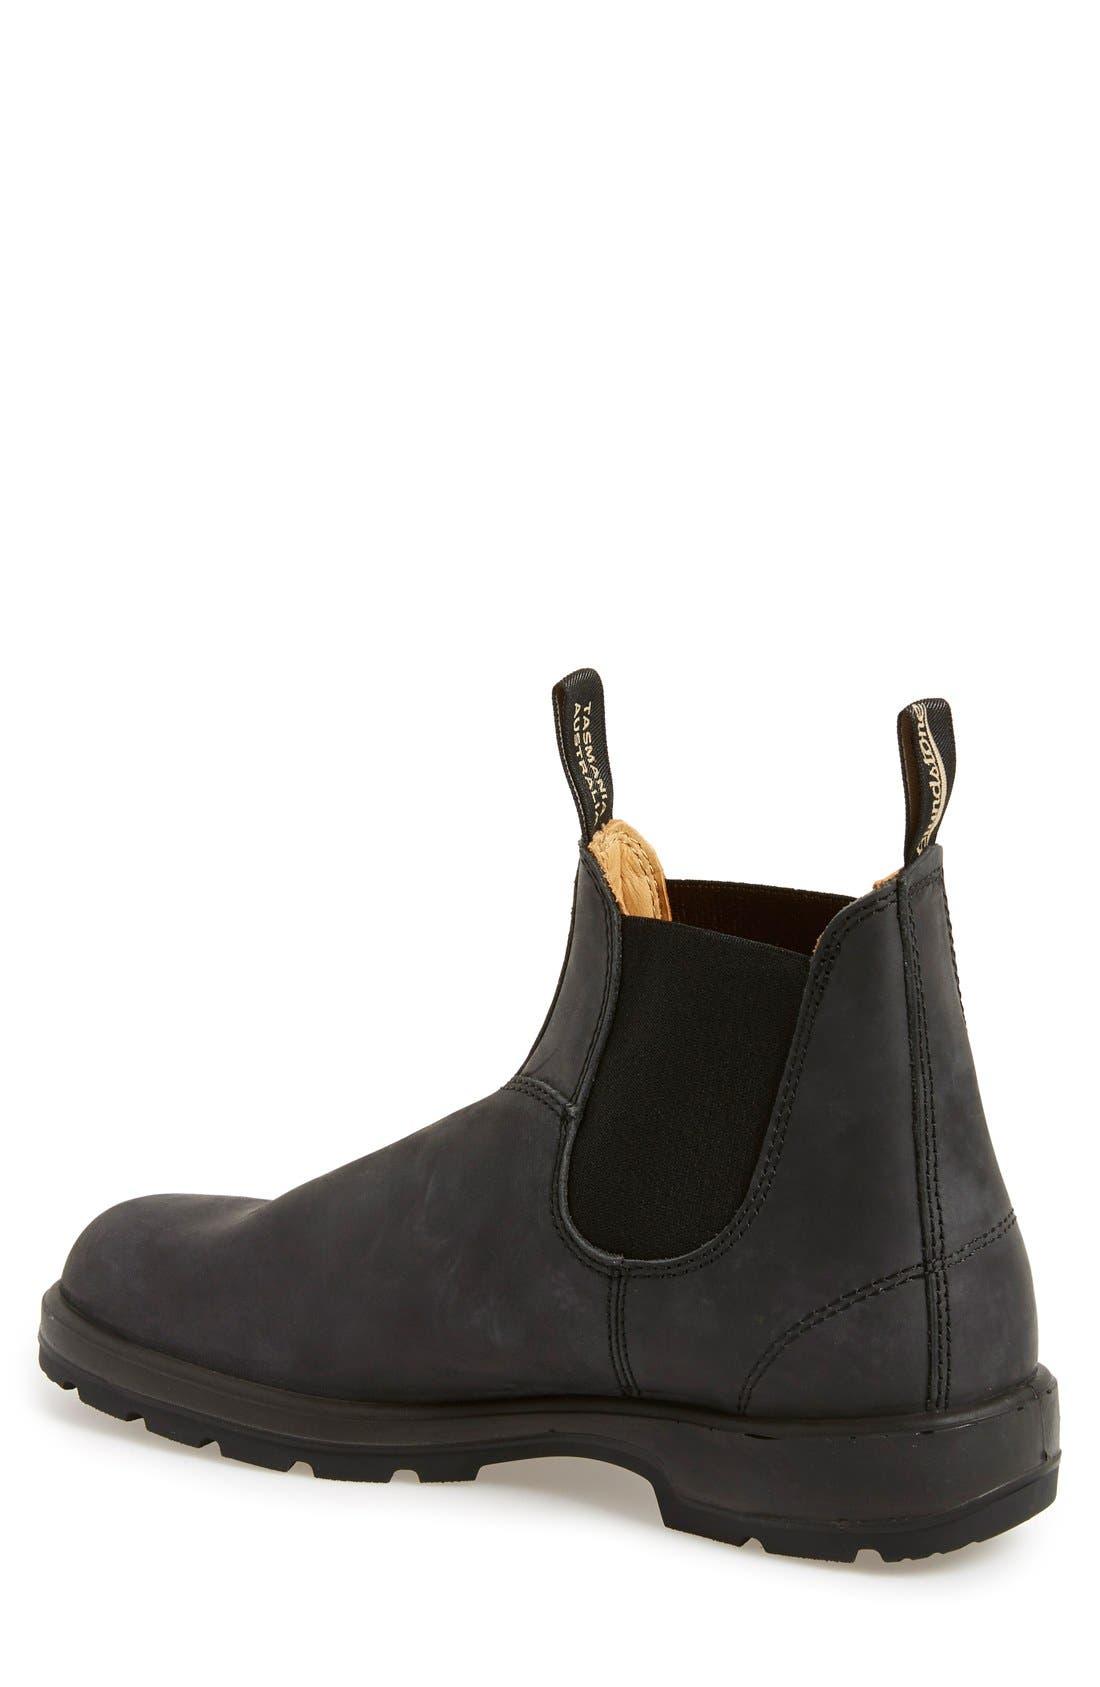 Footwear Chelsea Boot,                             Alternate thumbnail 2, color,                             RUSTIC BLACK